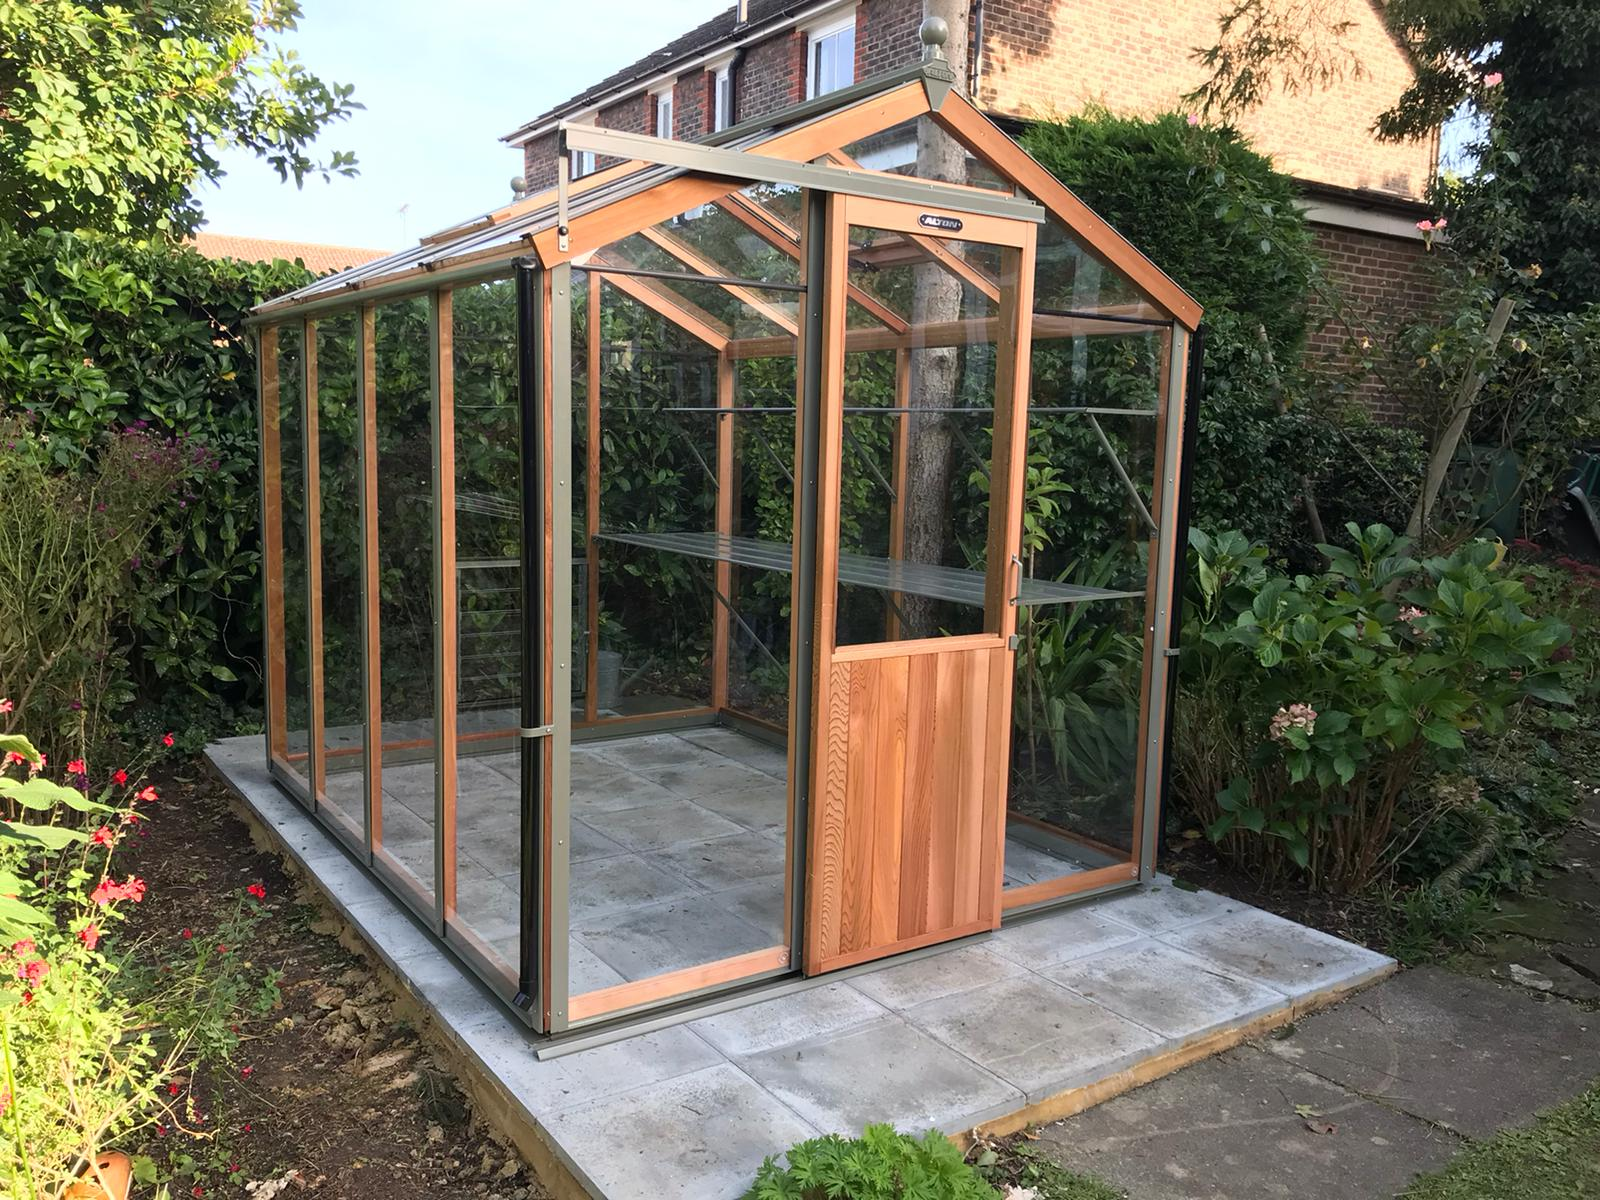 8ft x 6ft Alton Greenhouse Installation in Billingshurst - Magson